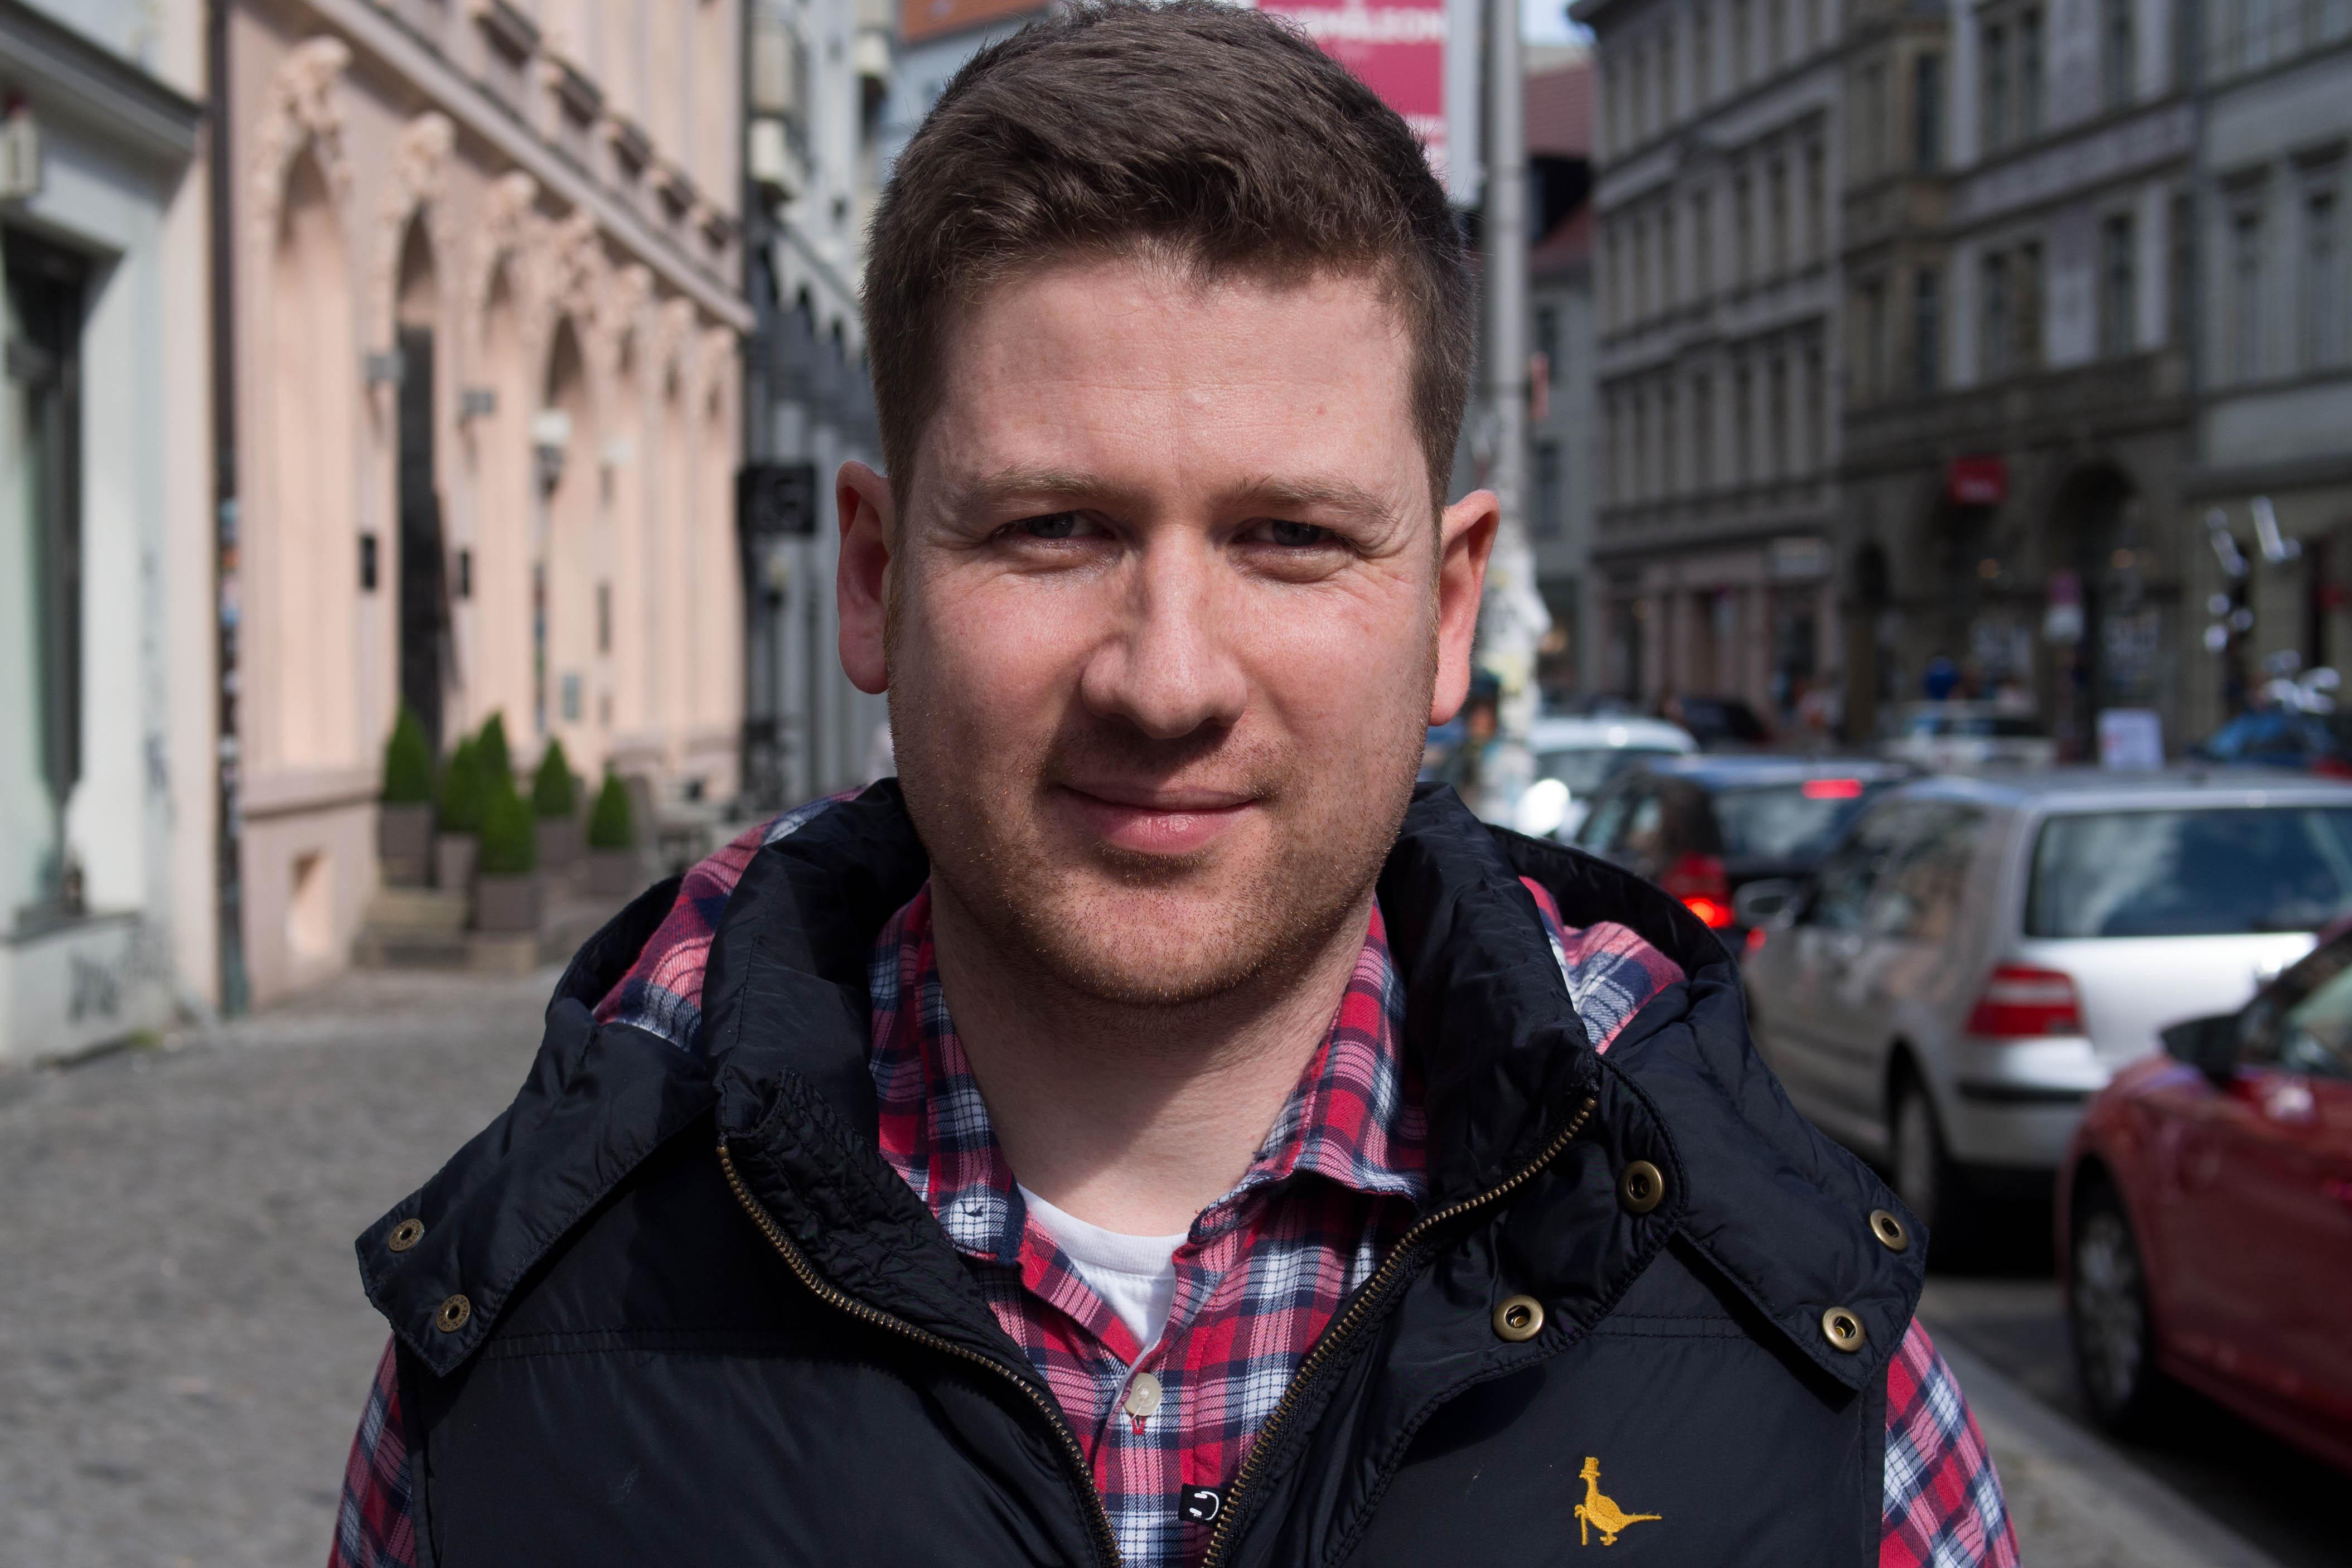 Twago founder Thomas Jajeh